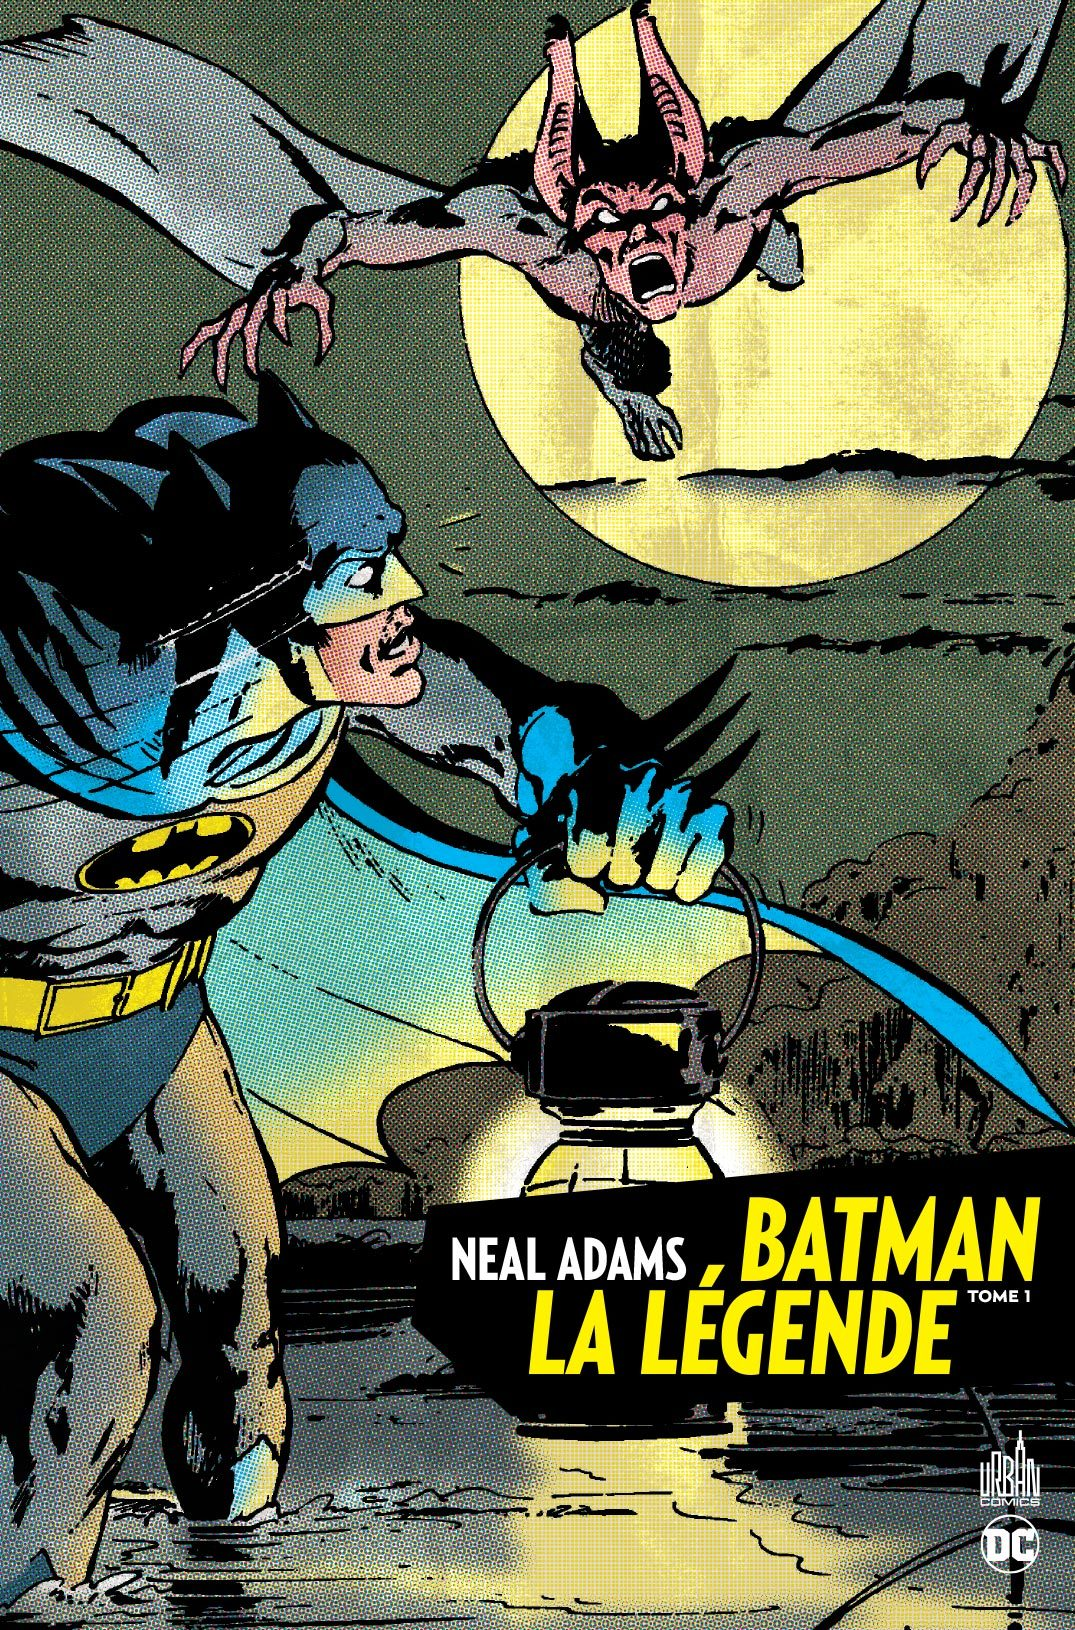 BATMAN LA LEGENDE  - NEAL ADAMS  TOME 1